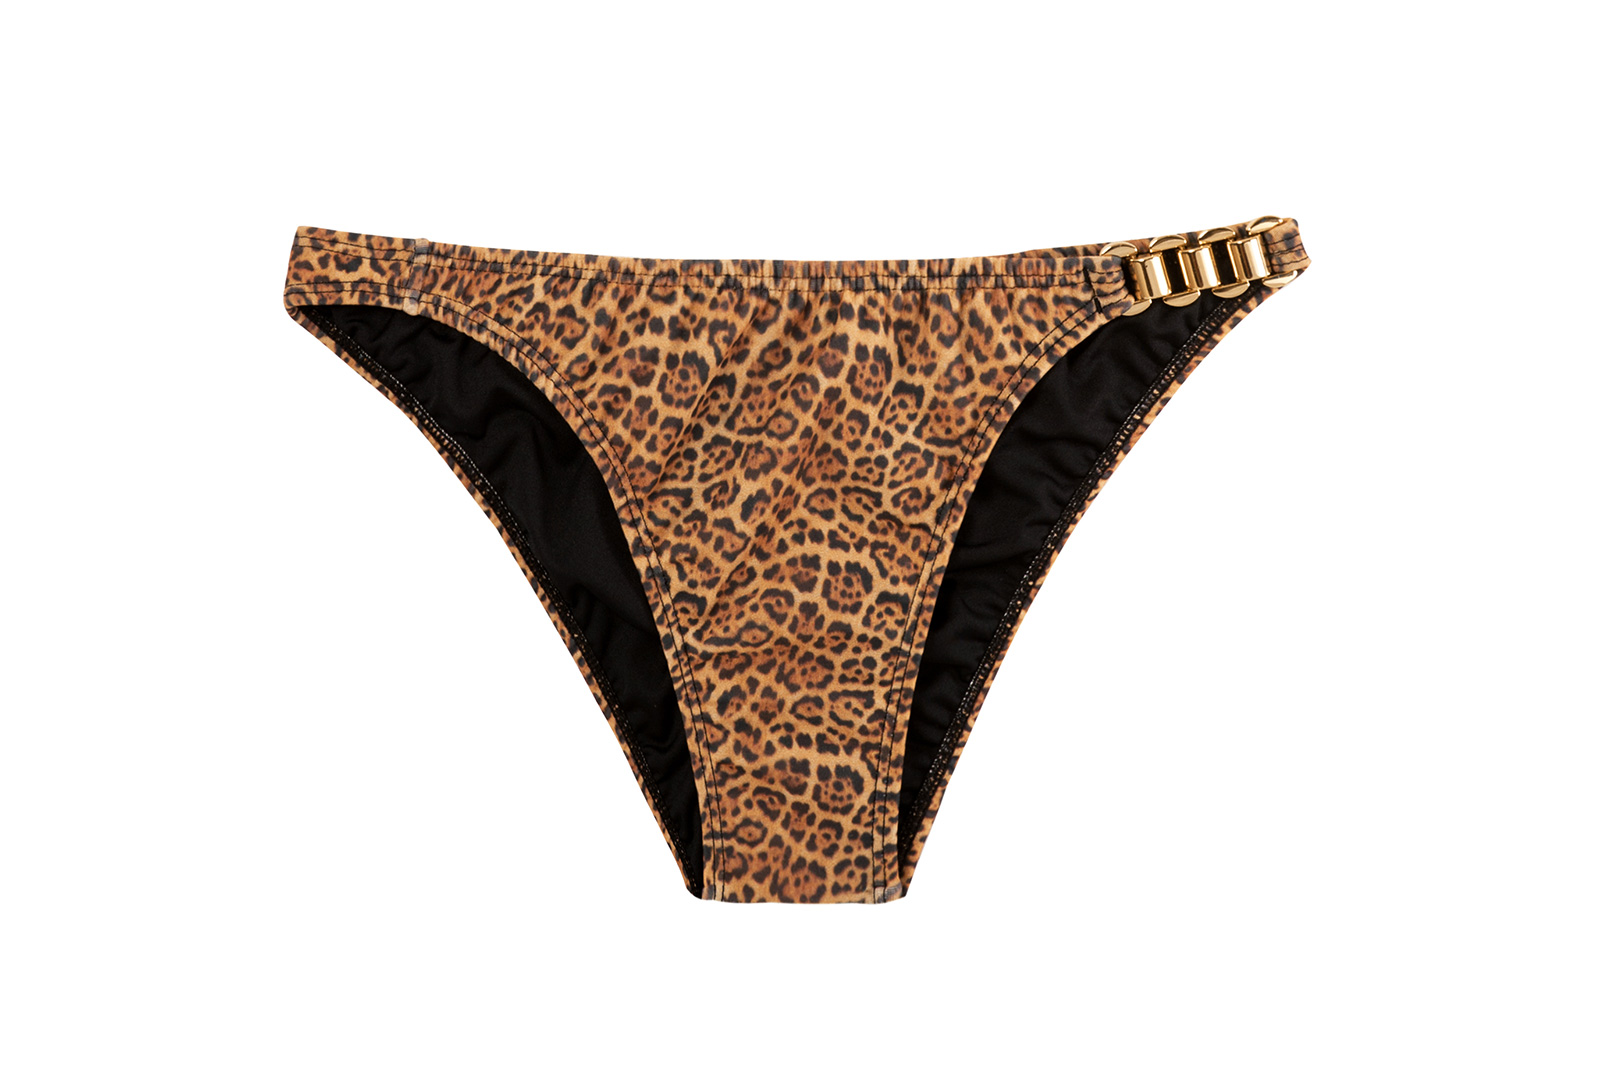 Brazilian Animal Print Bikini Bottom With Goldtone Accents Calcinha Bikini Jaguatiric